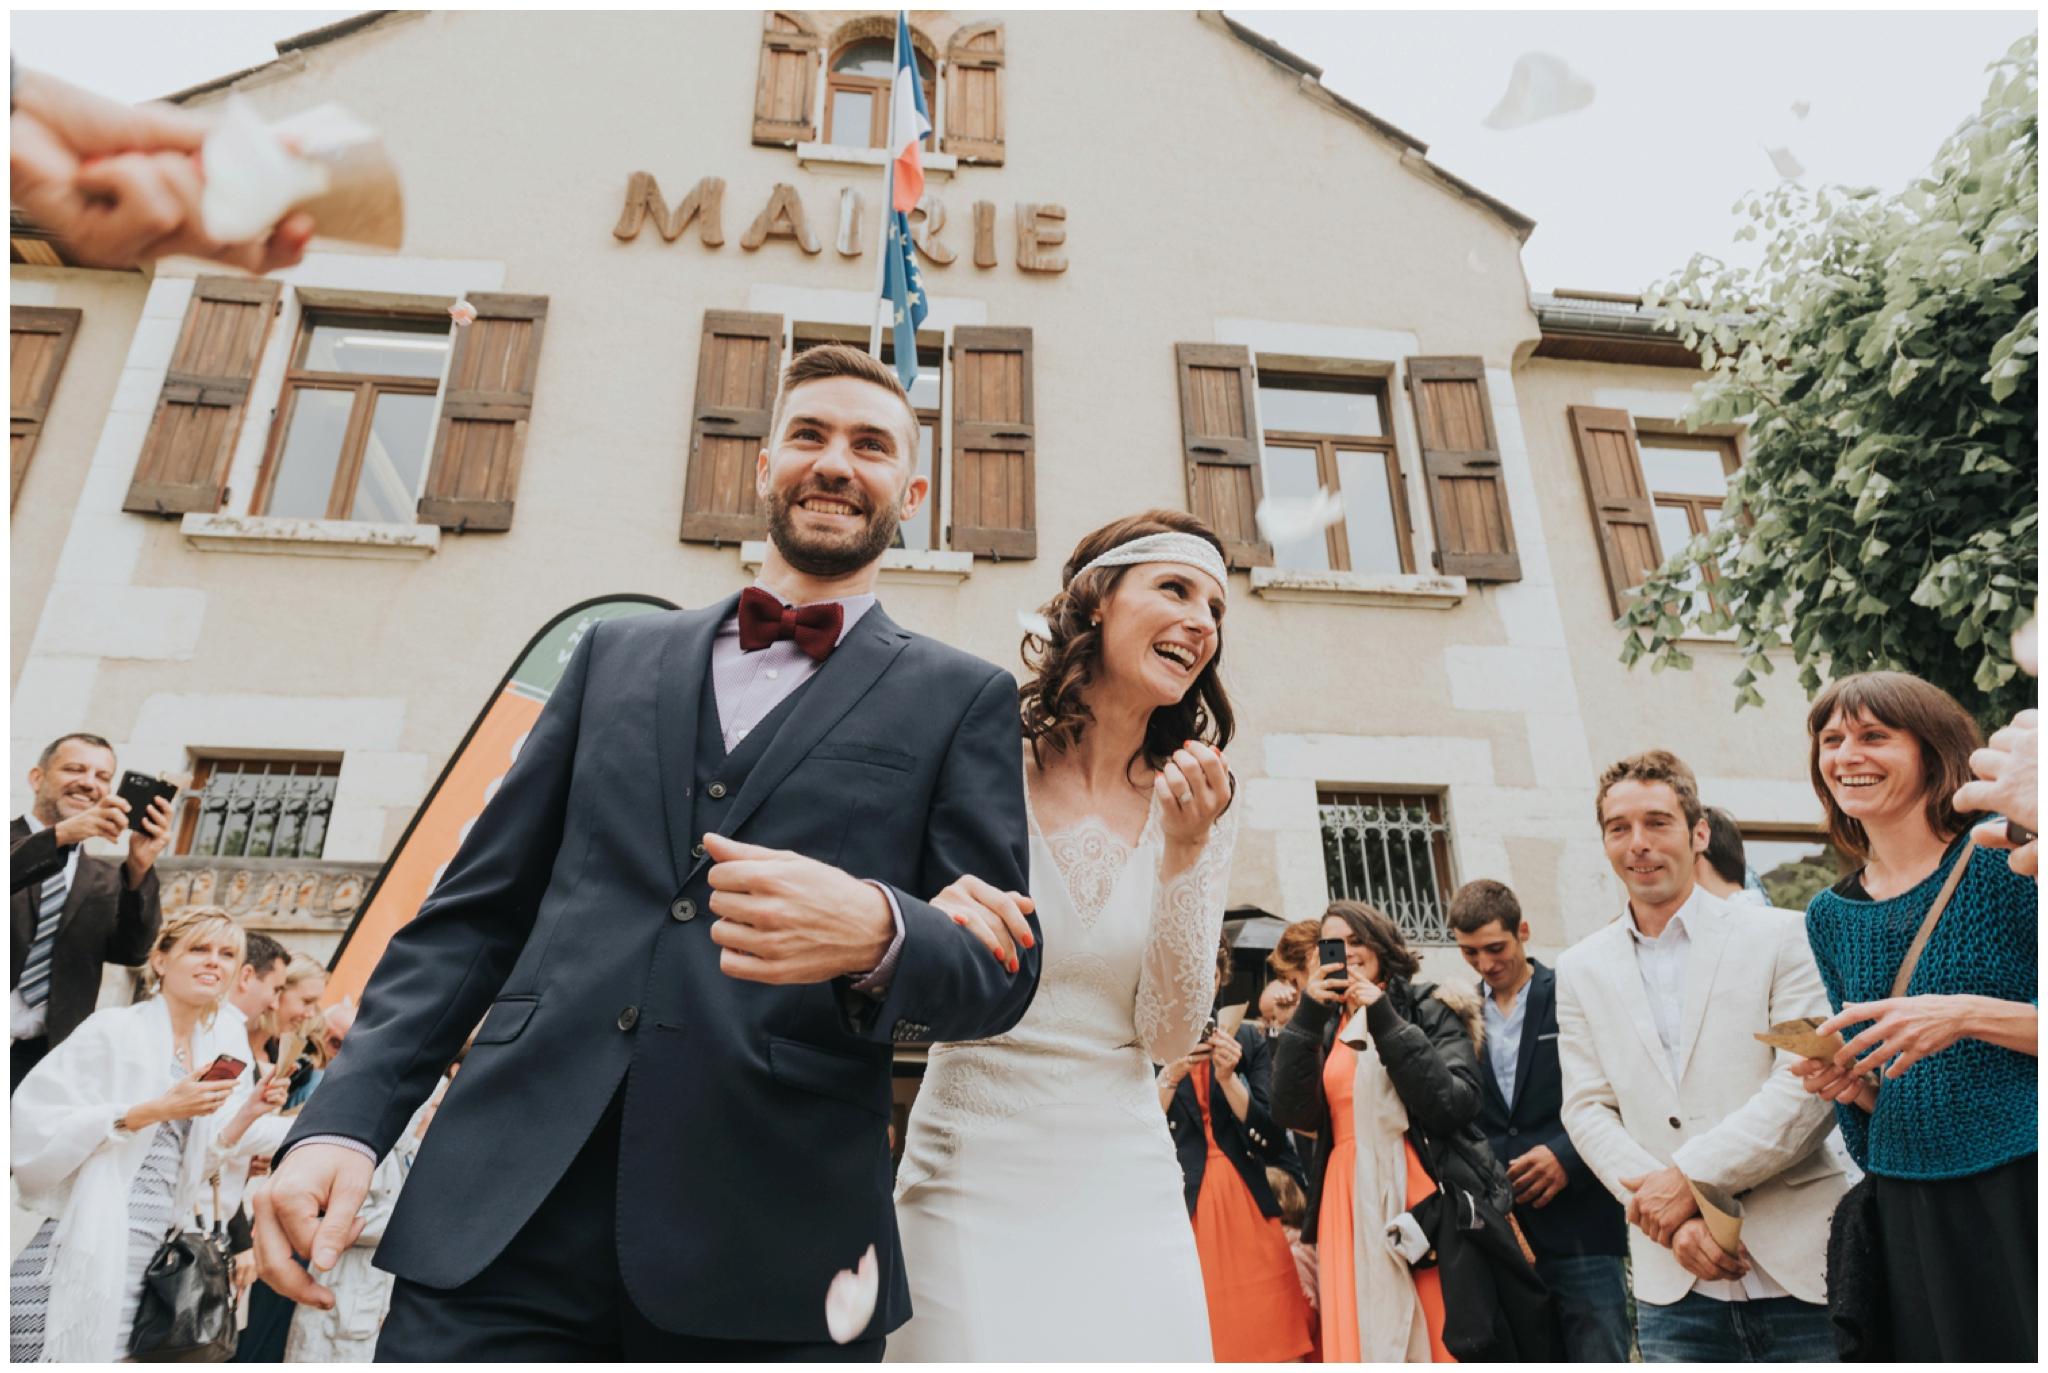 photographe-mariage-montagne-vercors-boho-folk-grenoble-annecy-alpes_0043